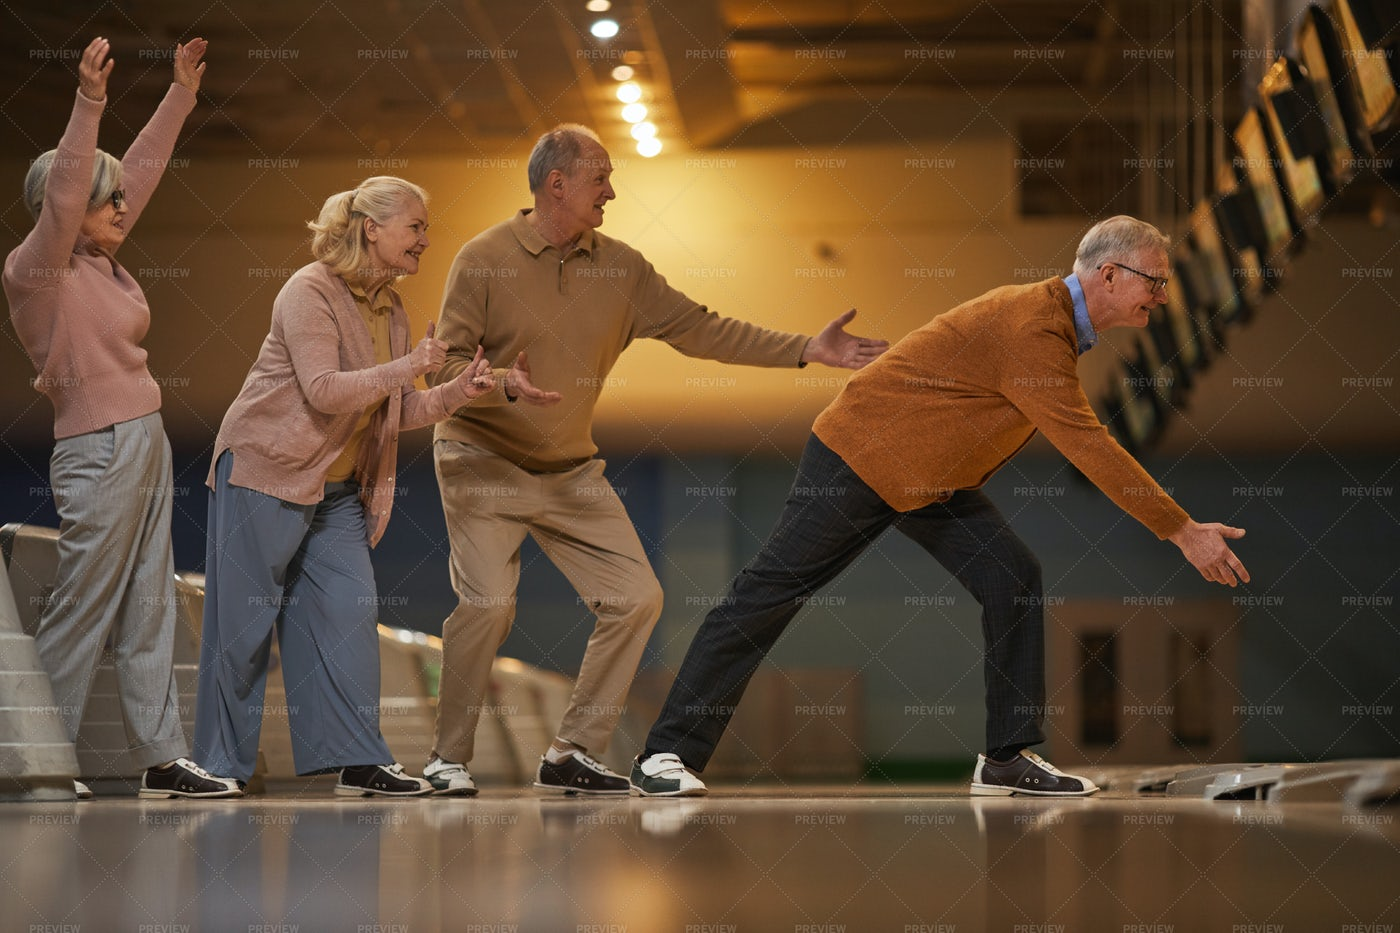 Senior People Playing Bowling: Stock Photos